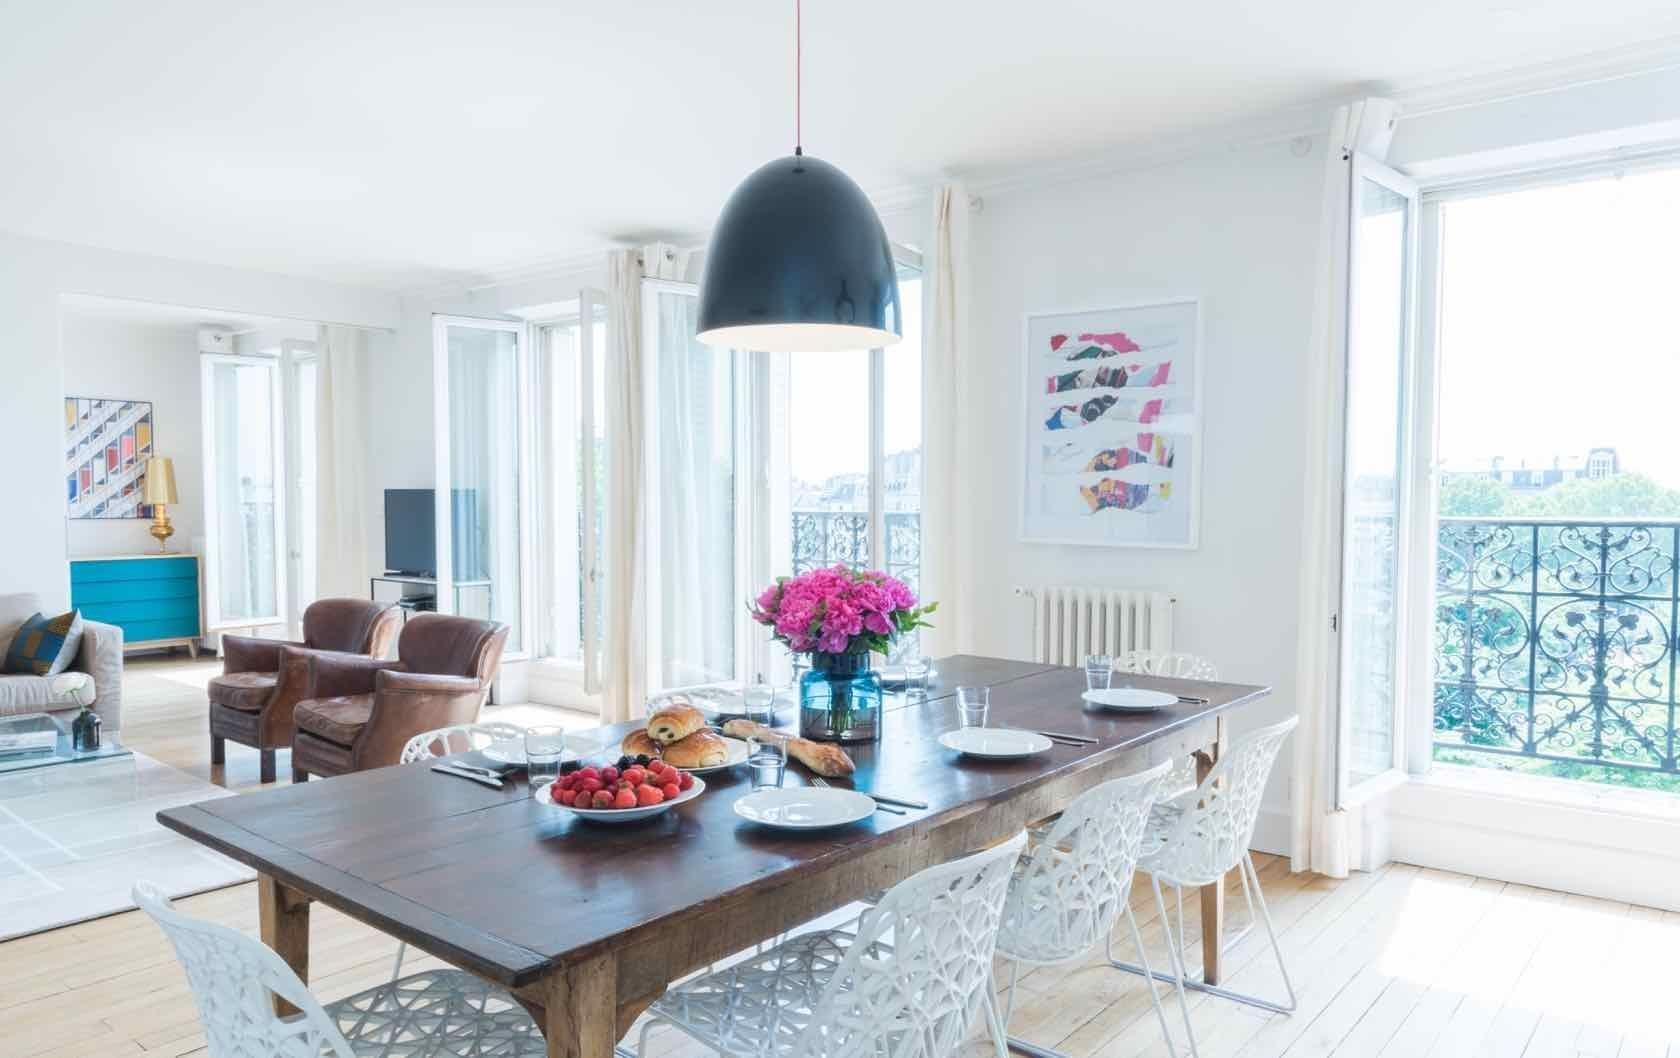 Astonishing Rental Apartment Decorating Ideas 02